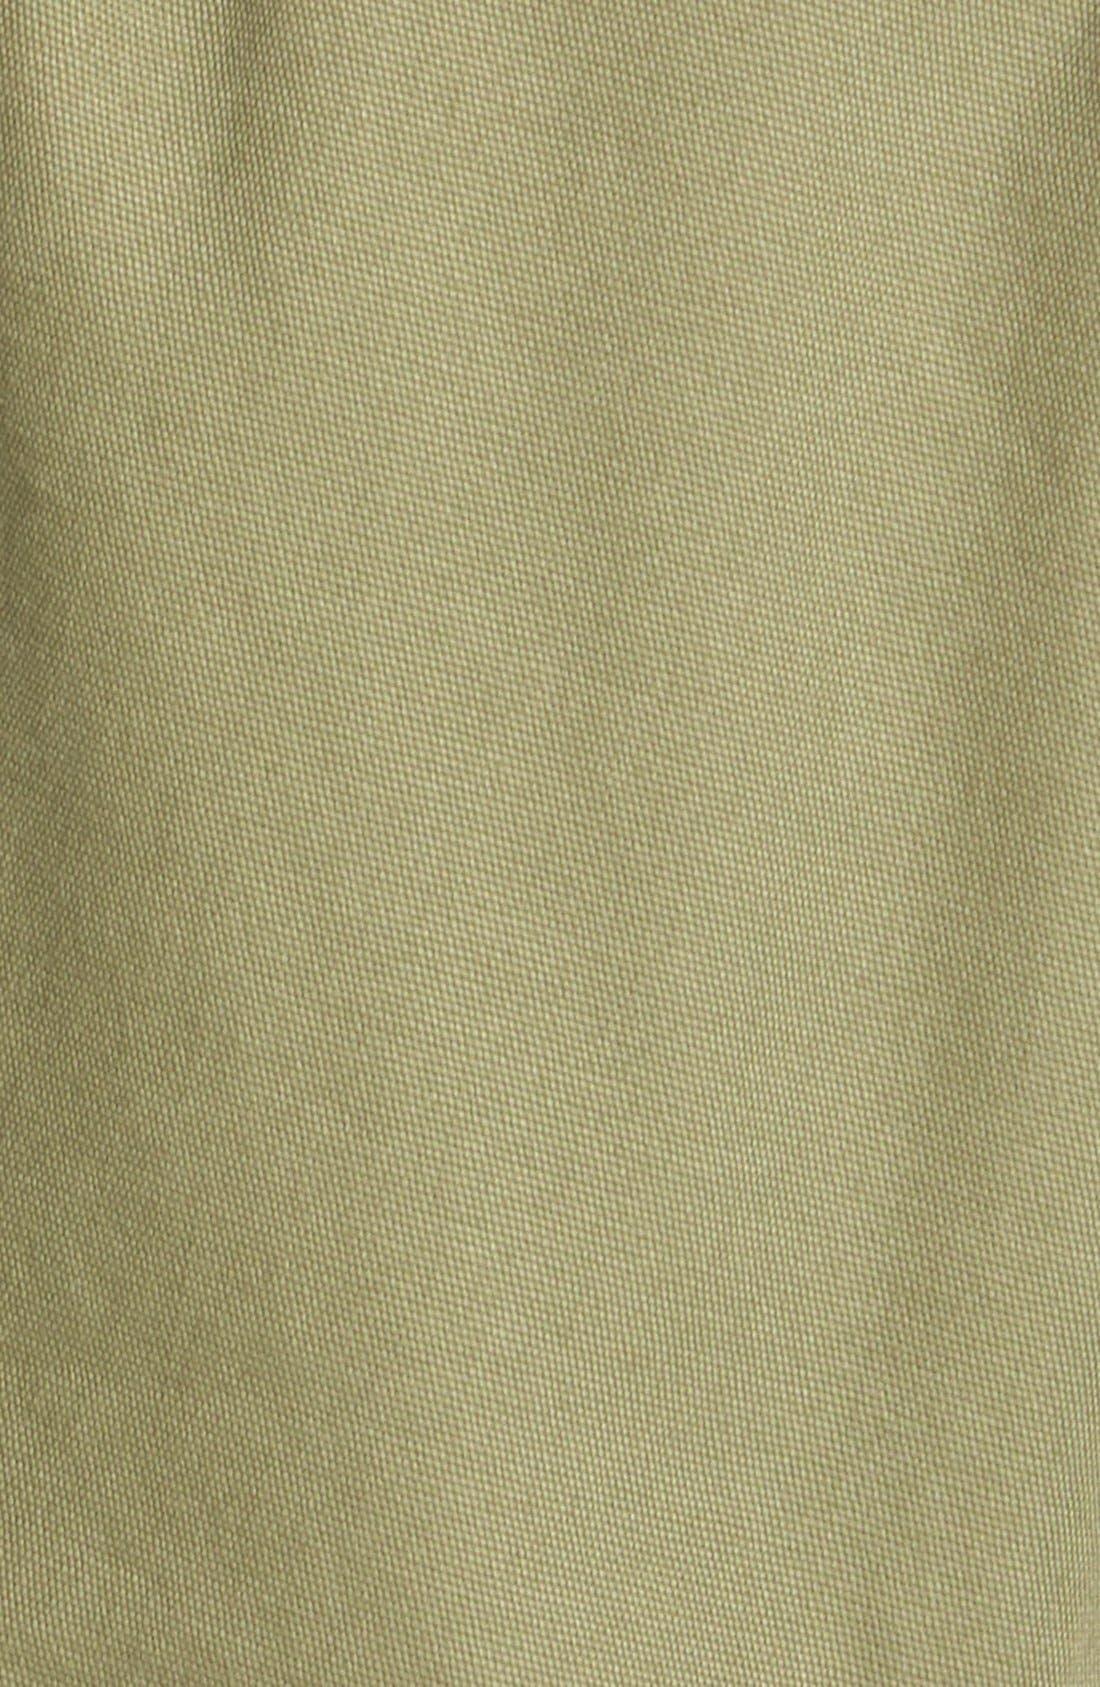 Hooded Field Jacket,                             Alternate thumbnail 2, color,                             311